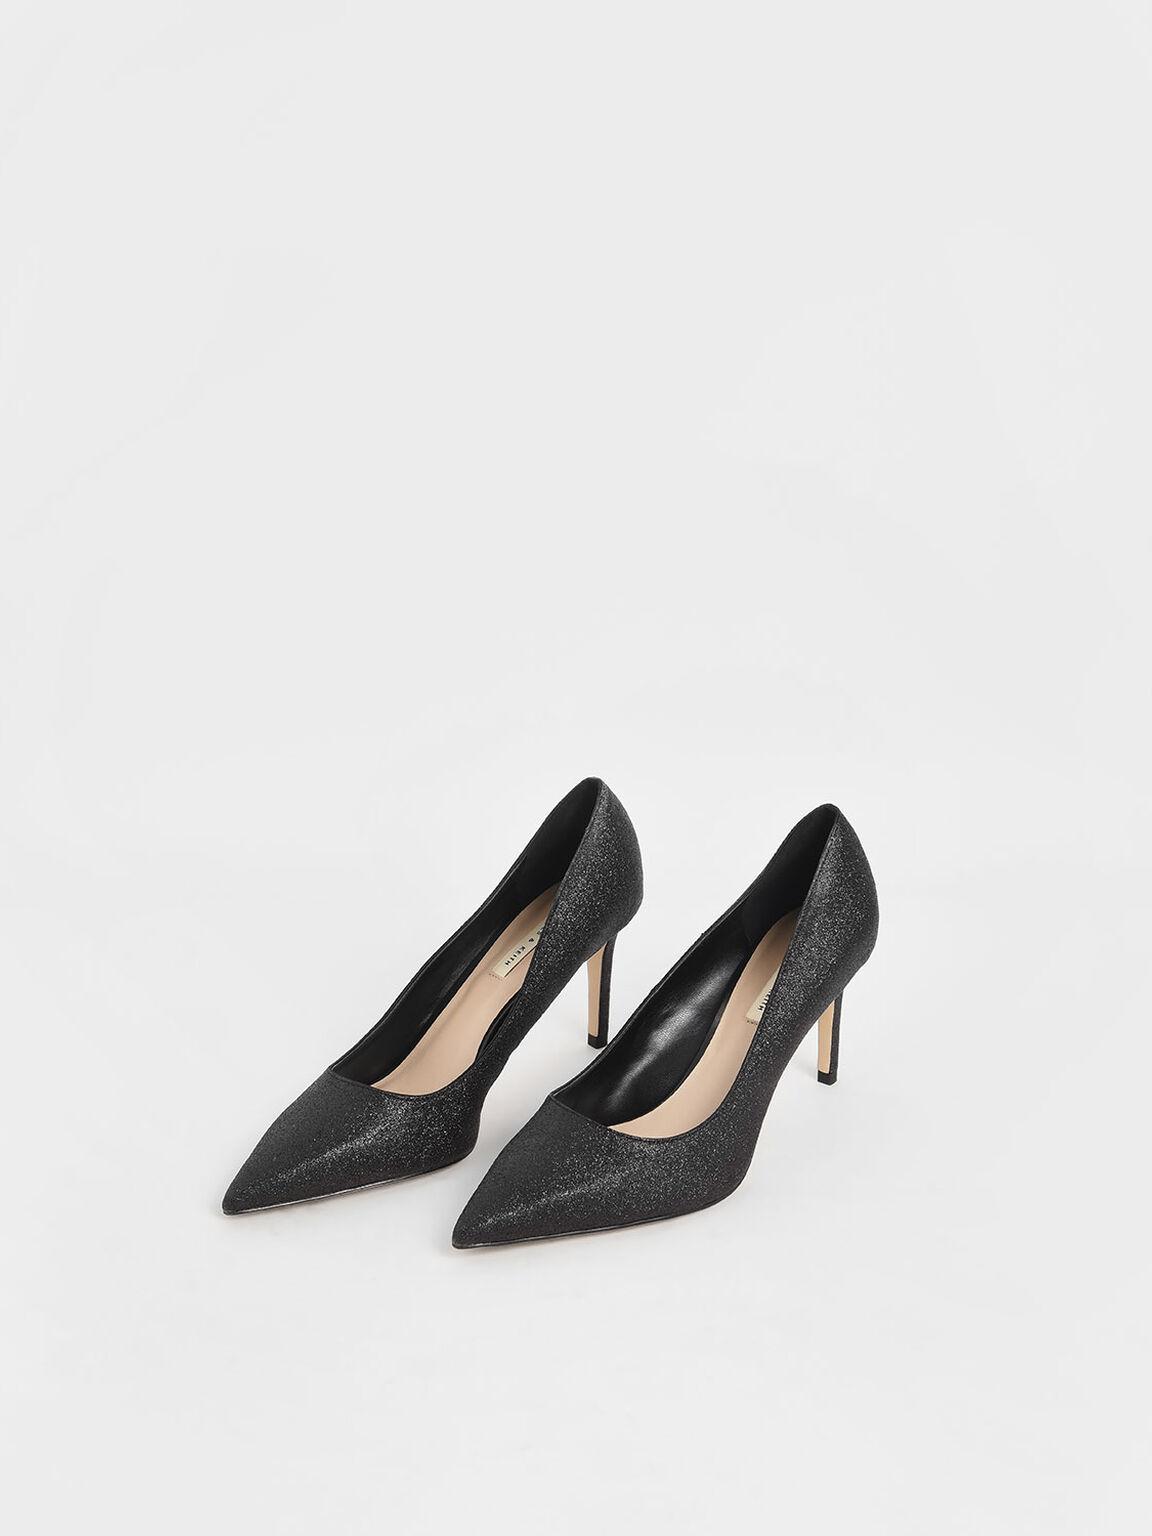 Glitter Stiletto Heel Pumps, Black, hi-res